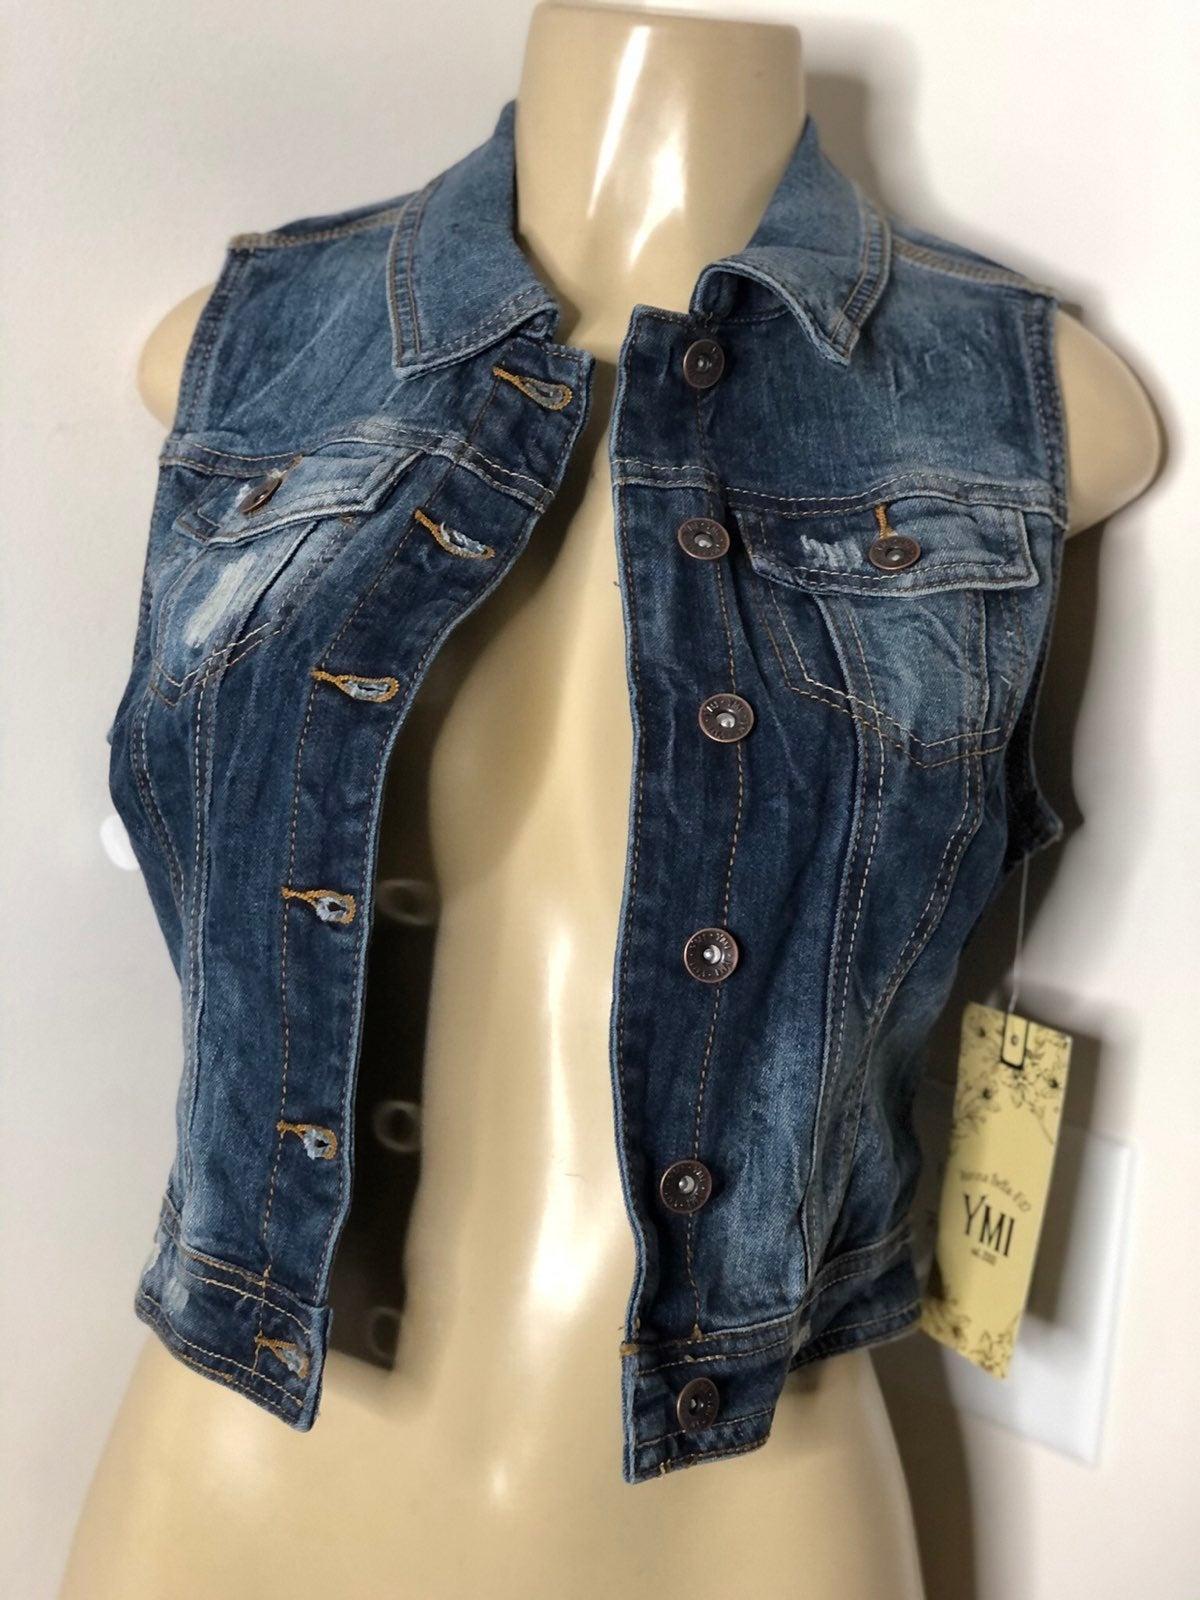 YMI jeans denim jacket vest